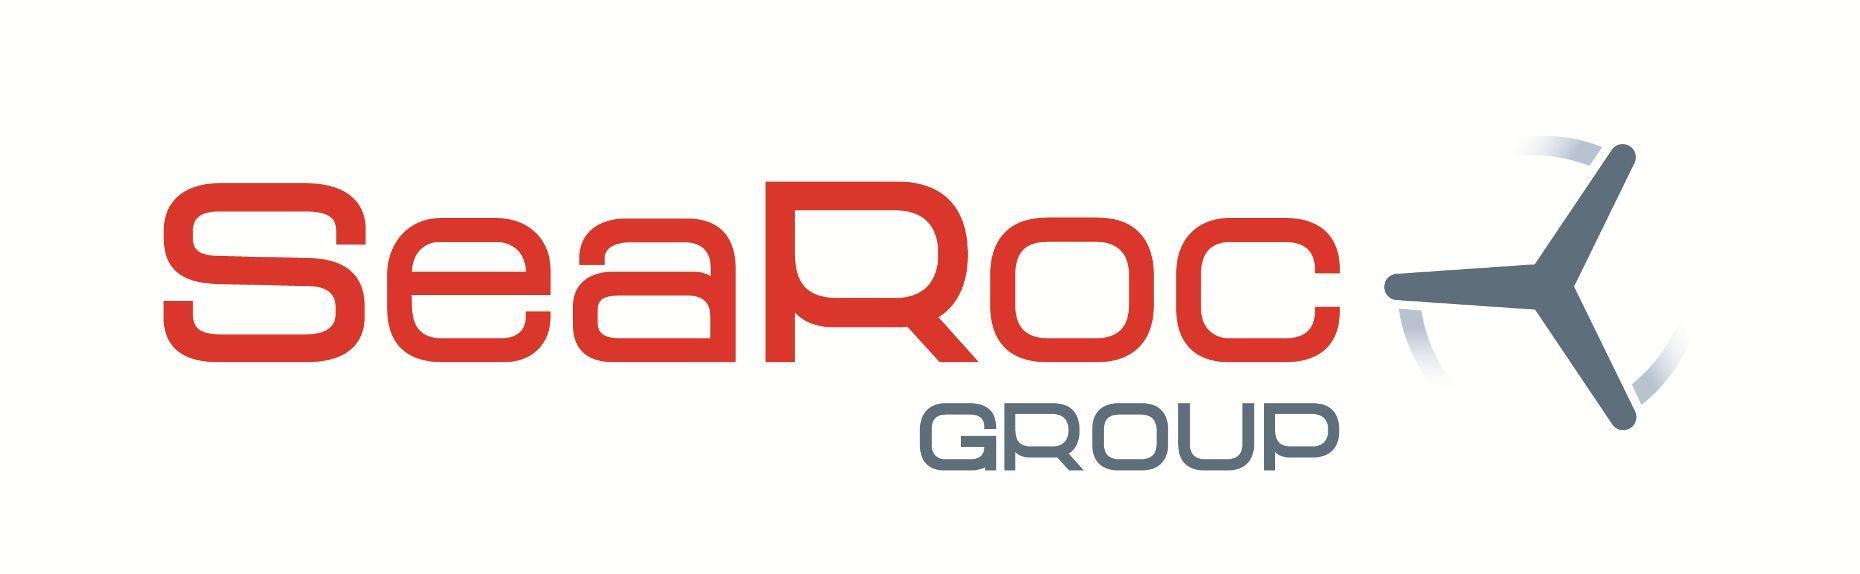 searocgroup Logo